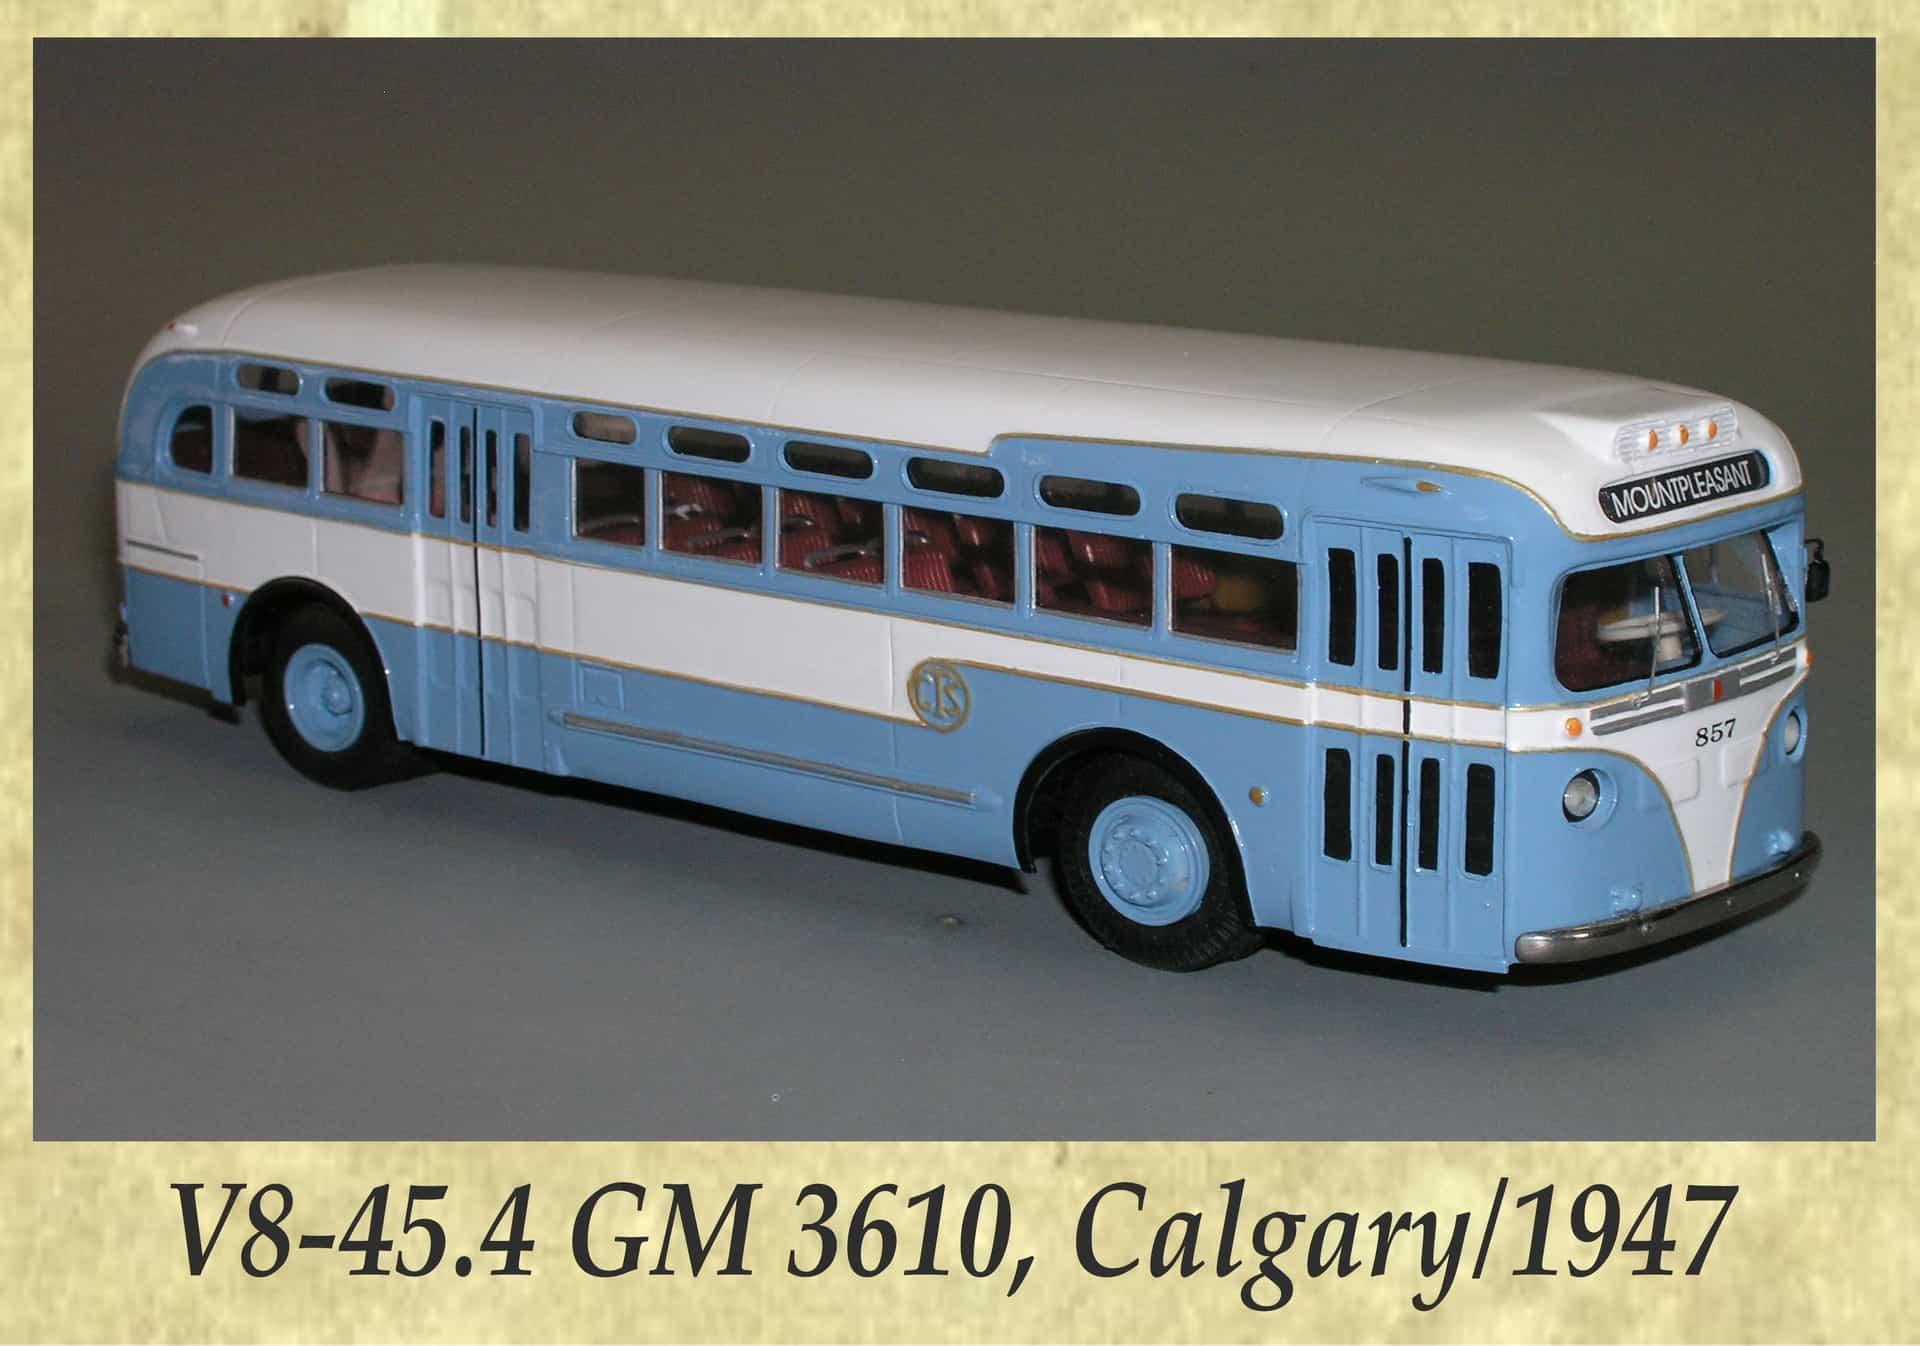 V8-45.4 GM 3610, Calgary 1947